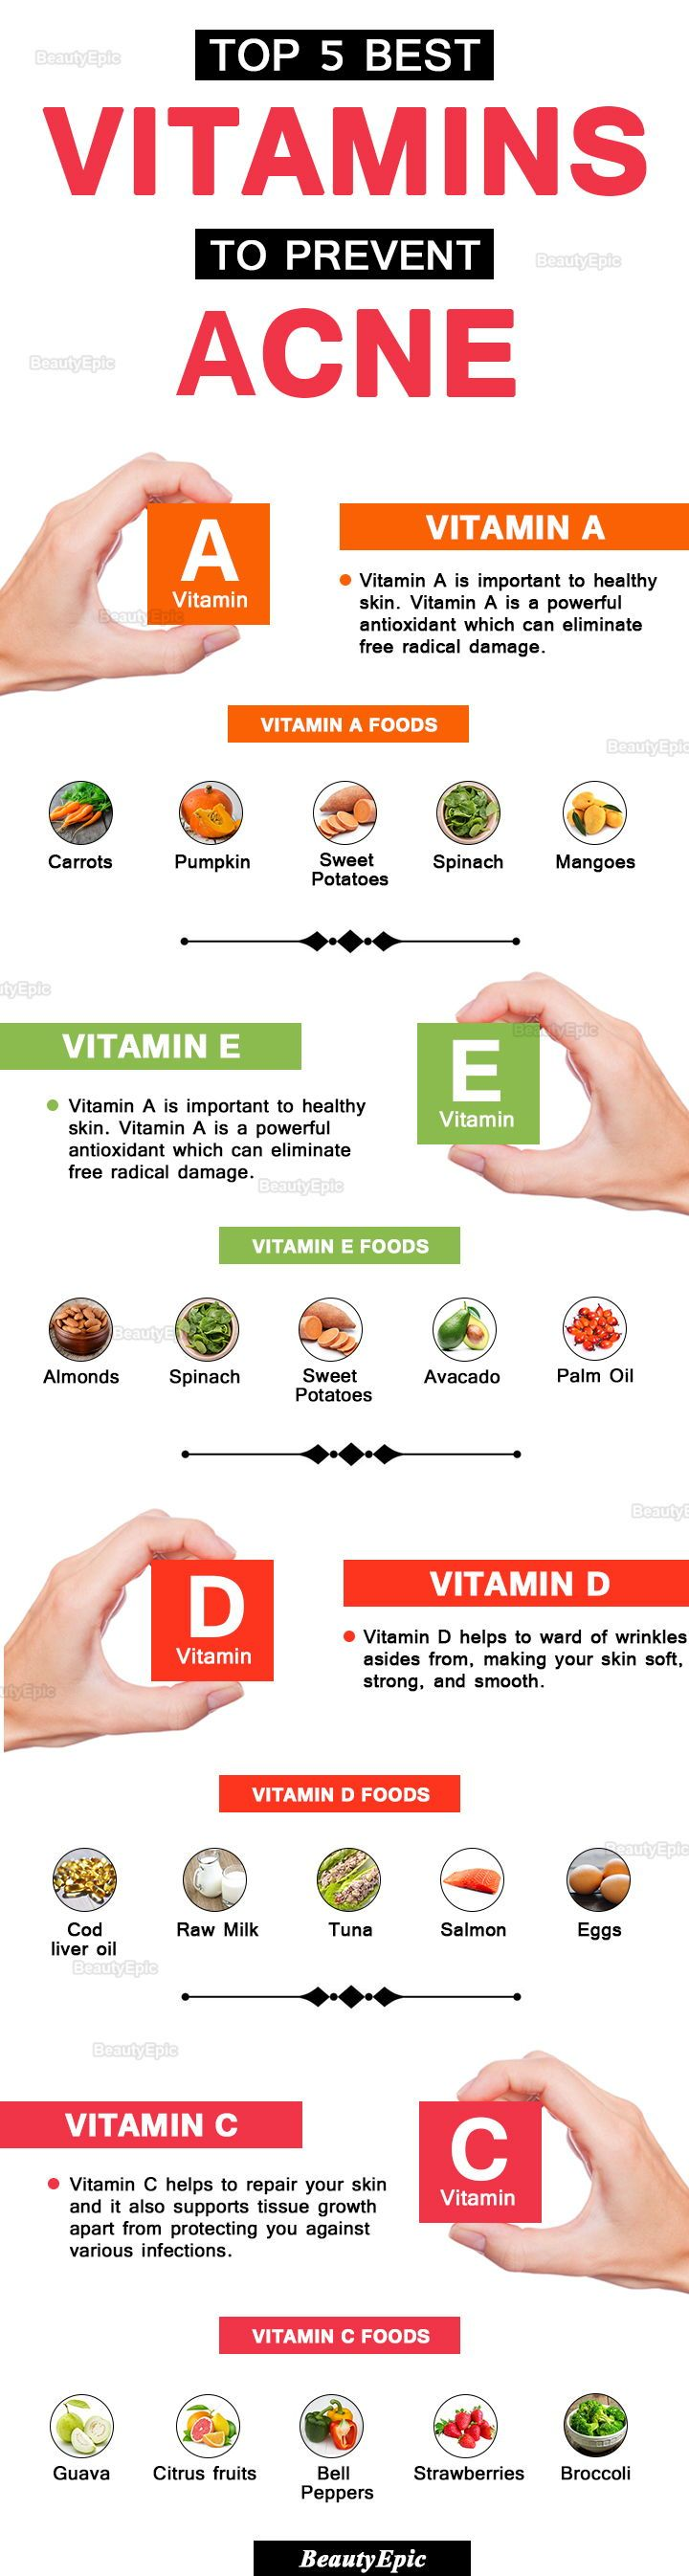 Vitamins to Prevent Acne